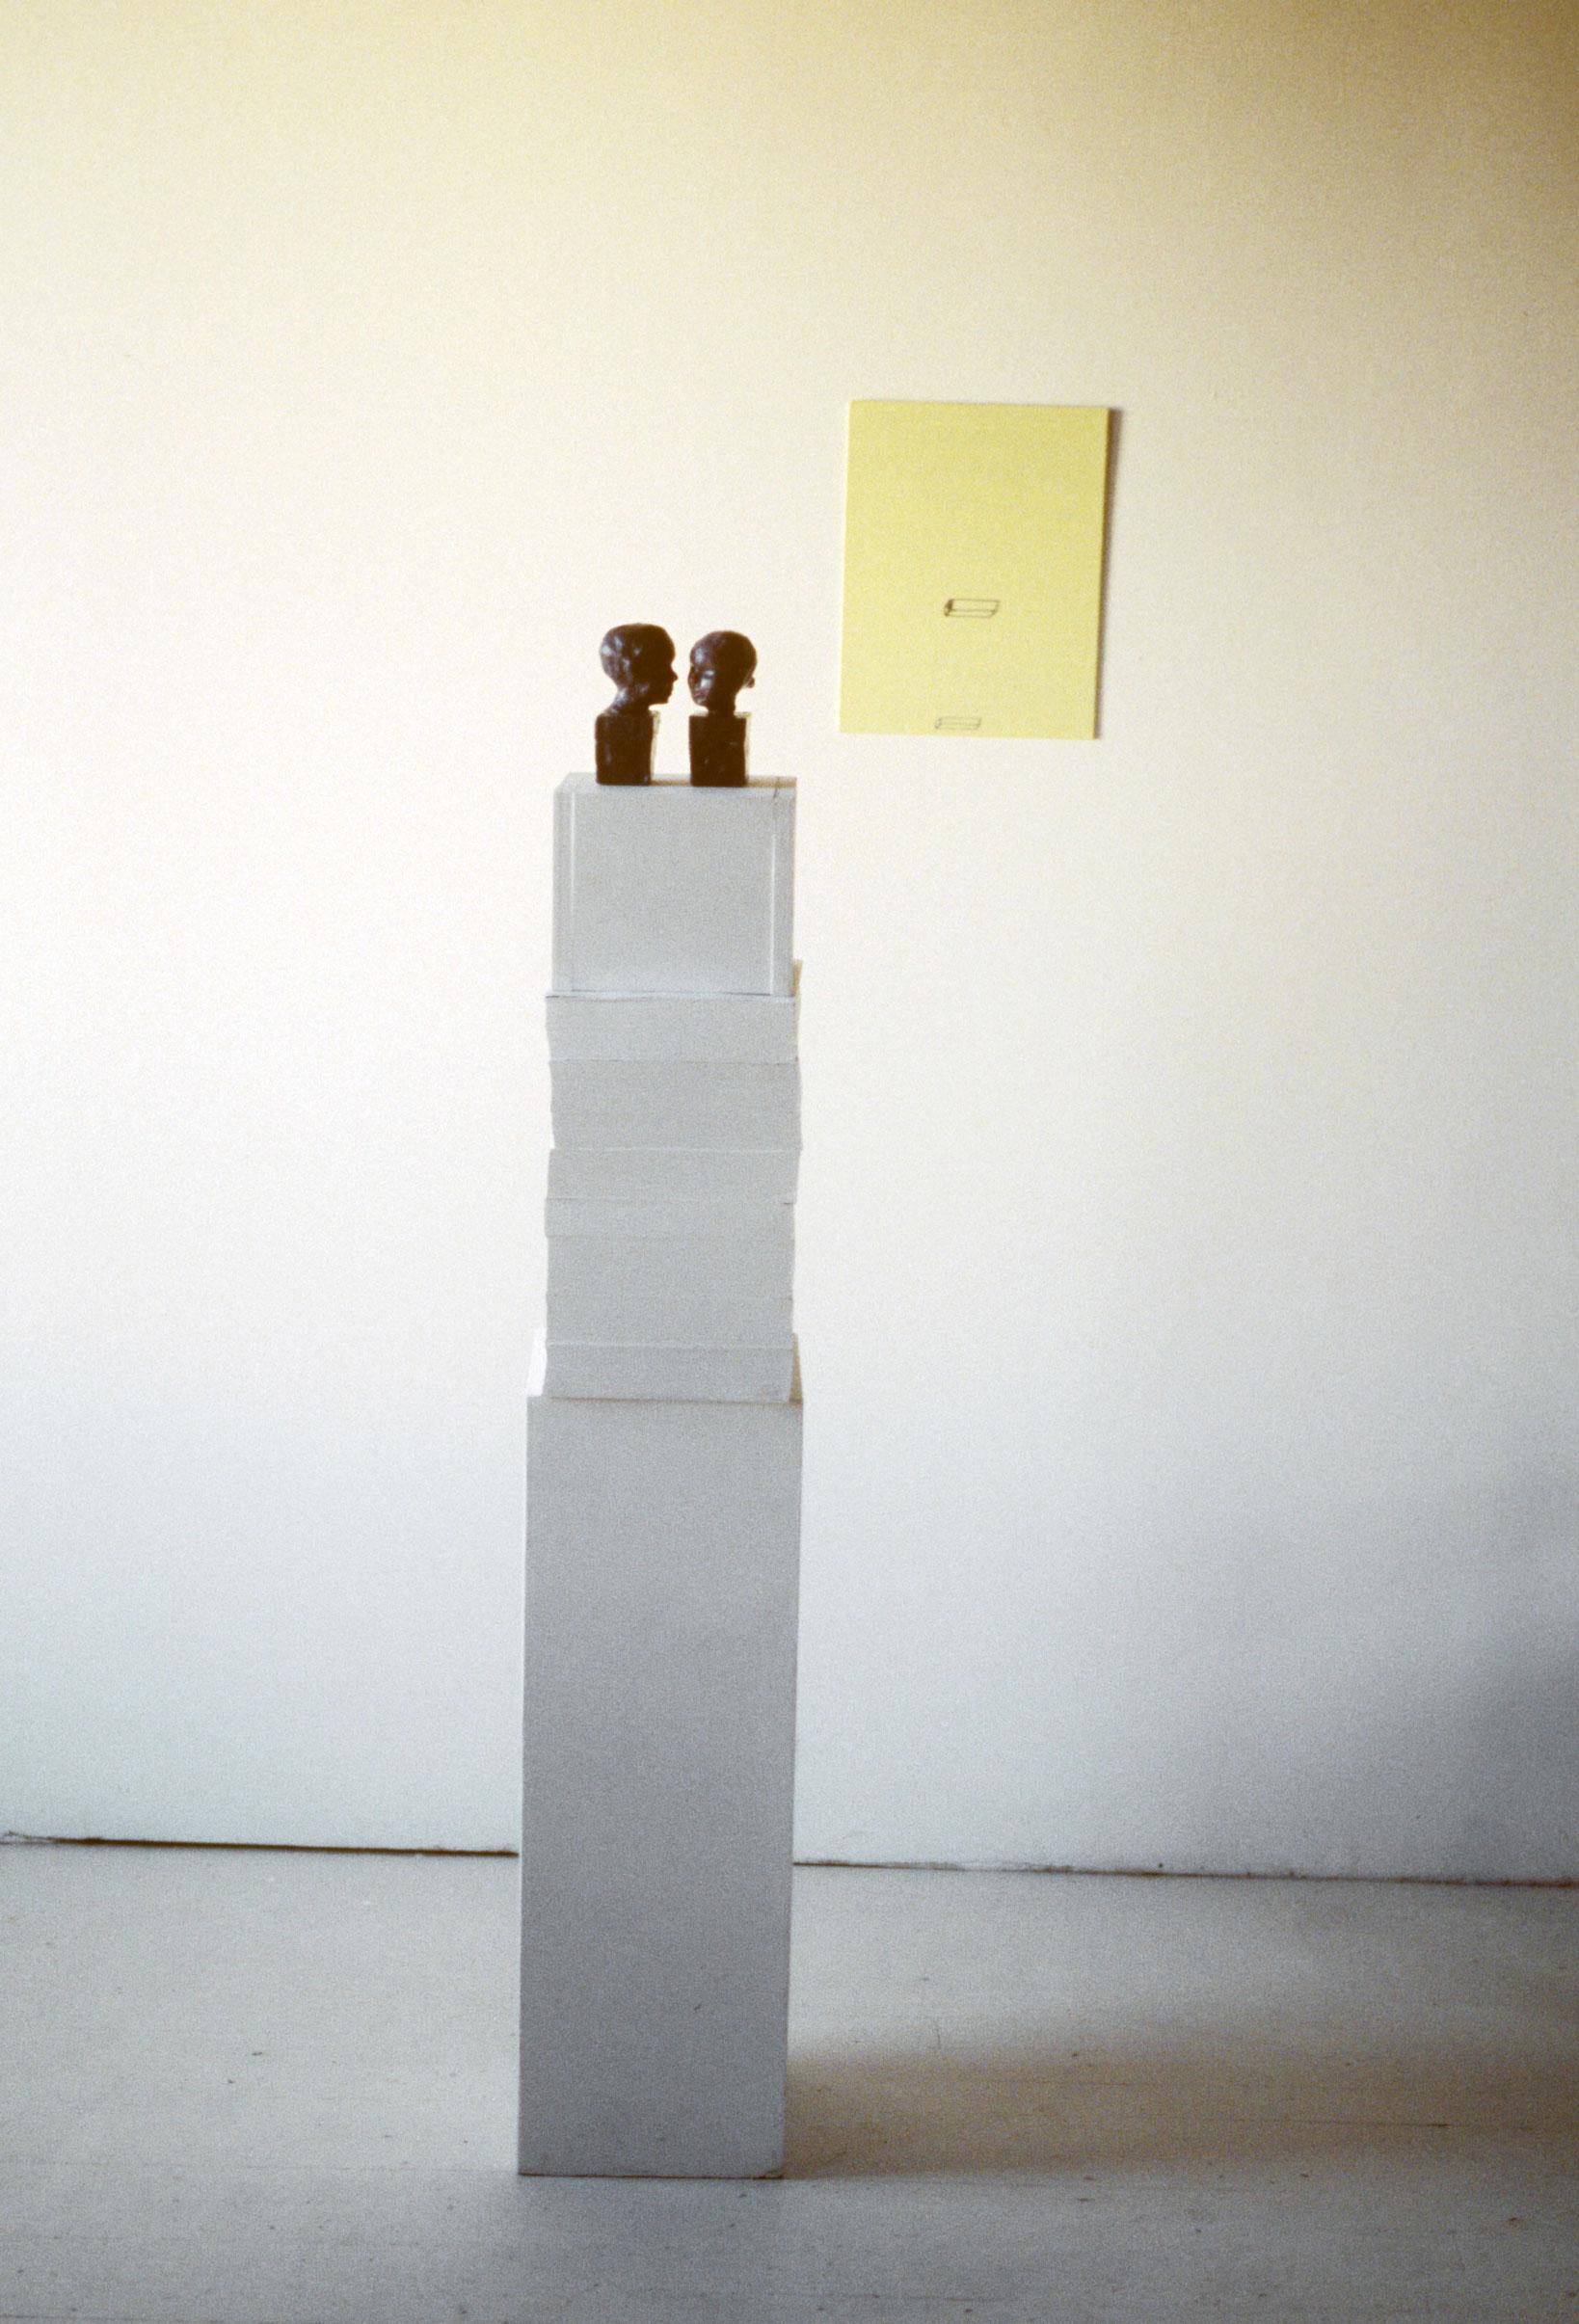 Installation View,Boesky & Callery Fine Arts, New York, New York